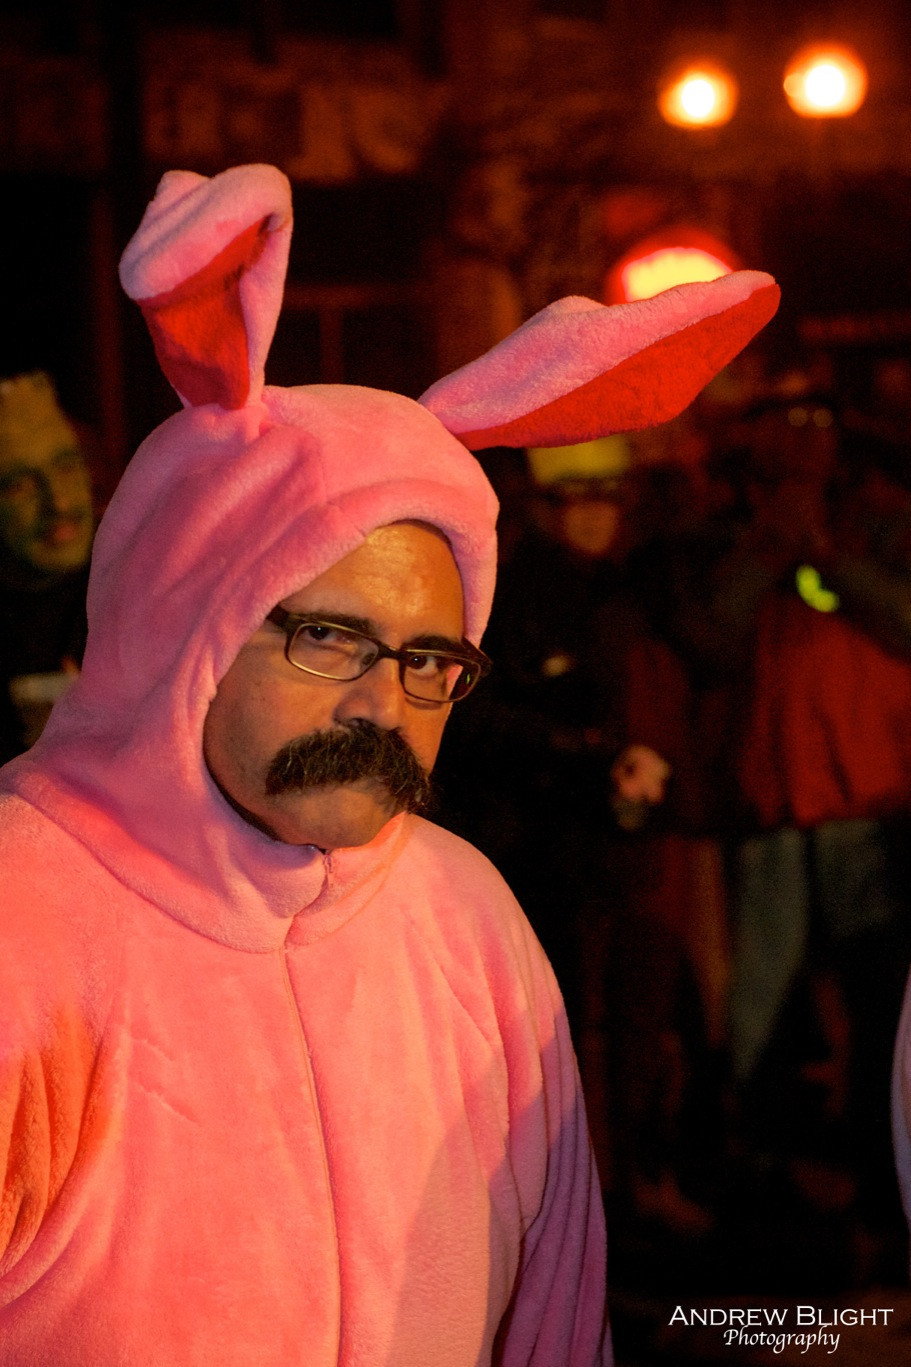 A Christmas Story pink bunny costume